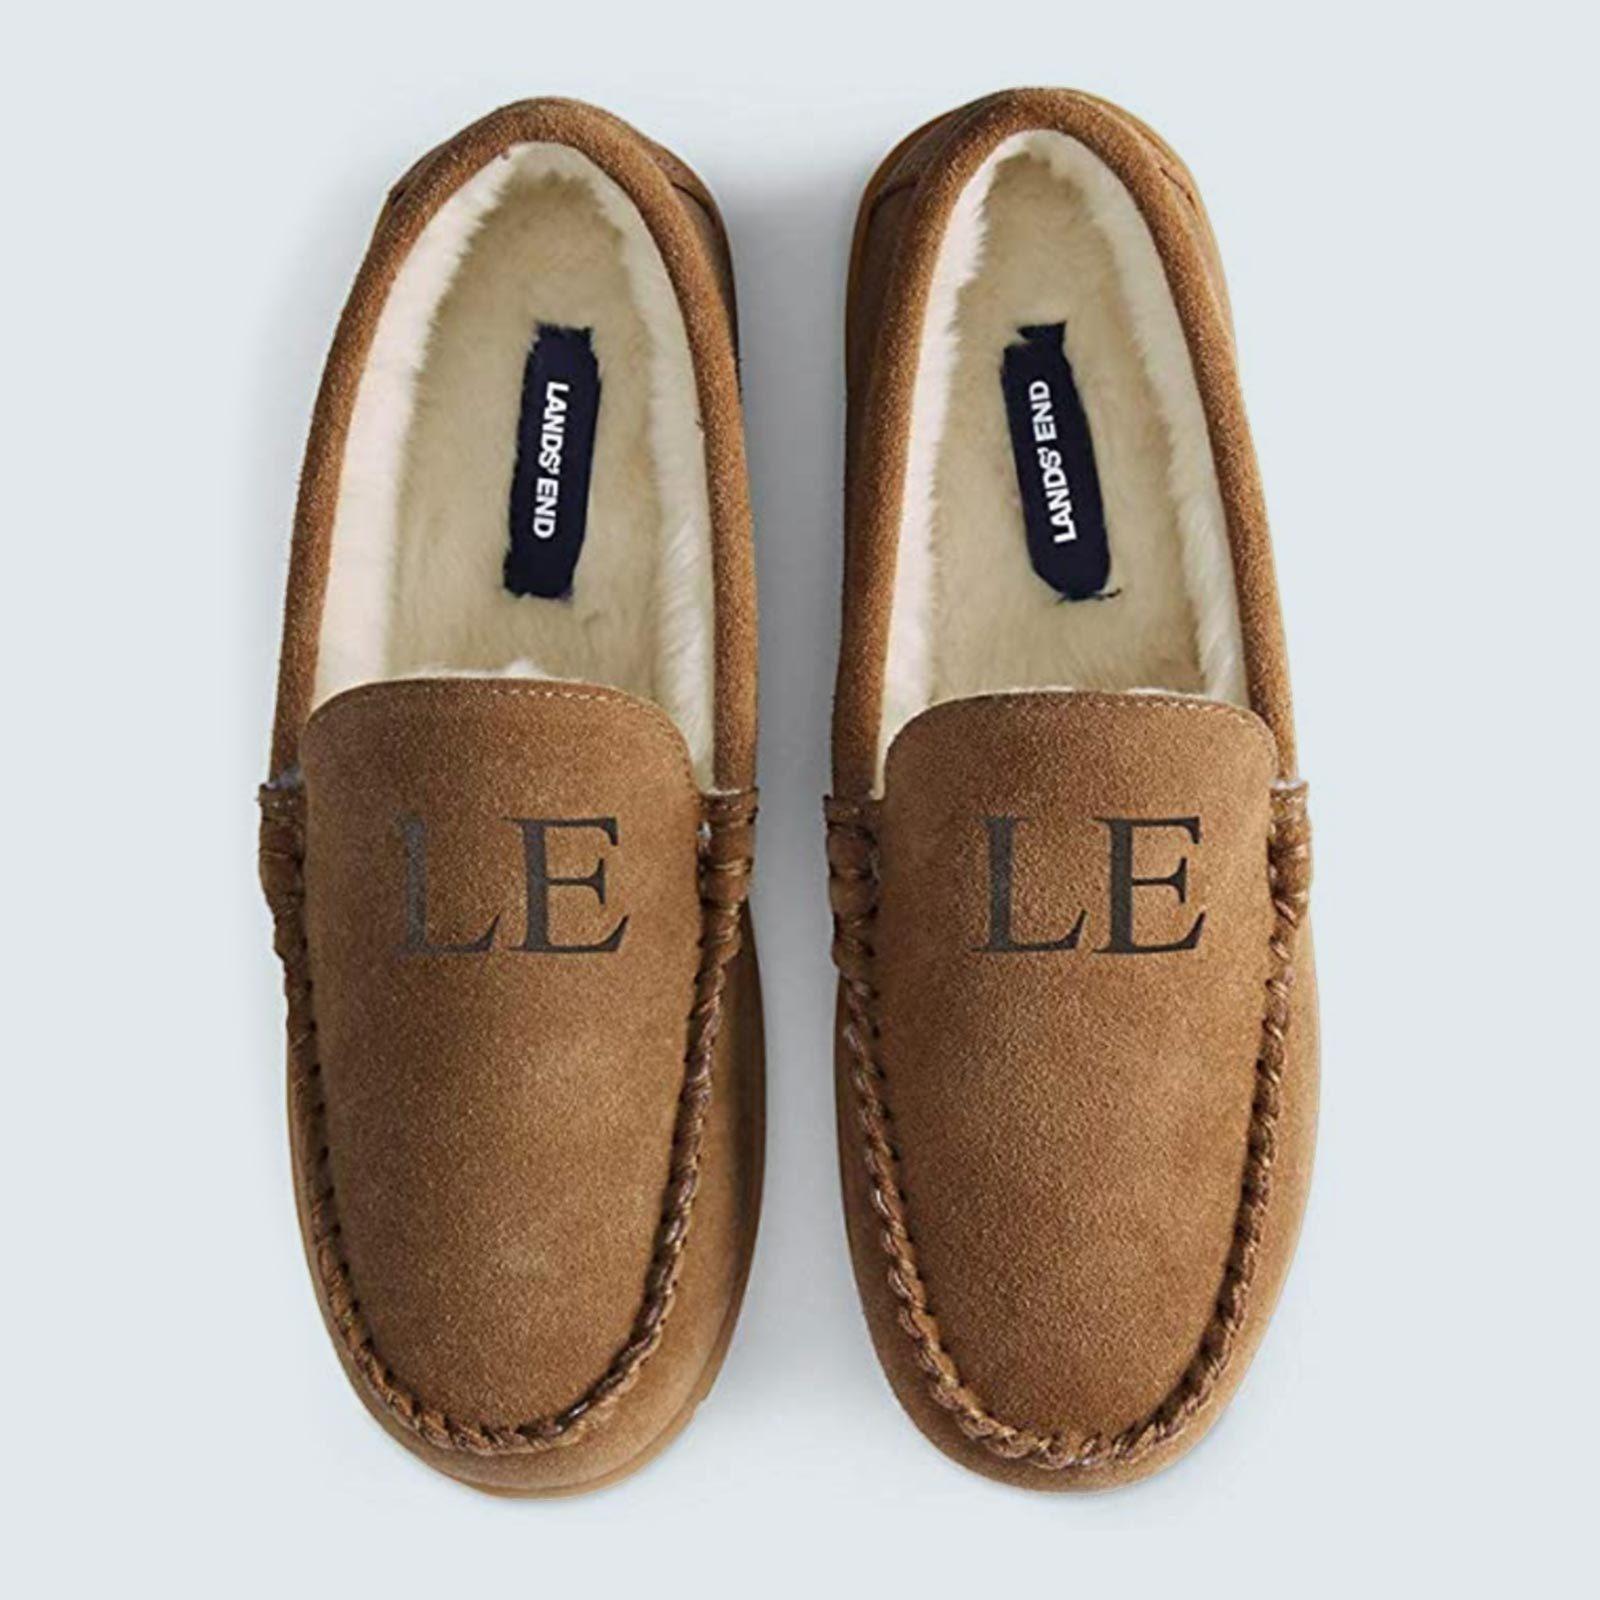 Best monogrammed slippers: Land's End Moccasin Slipper